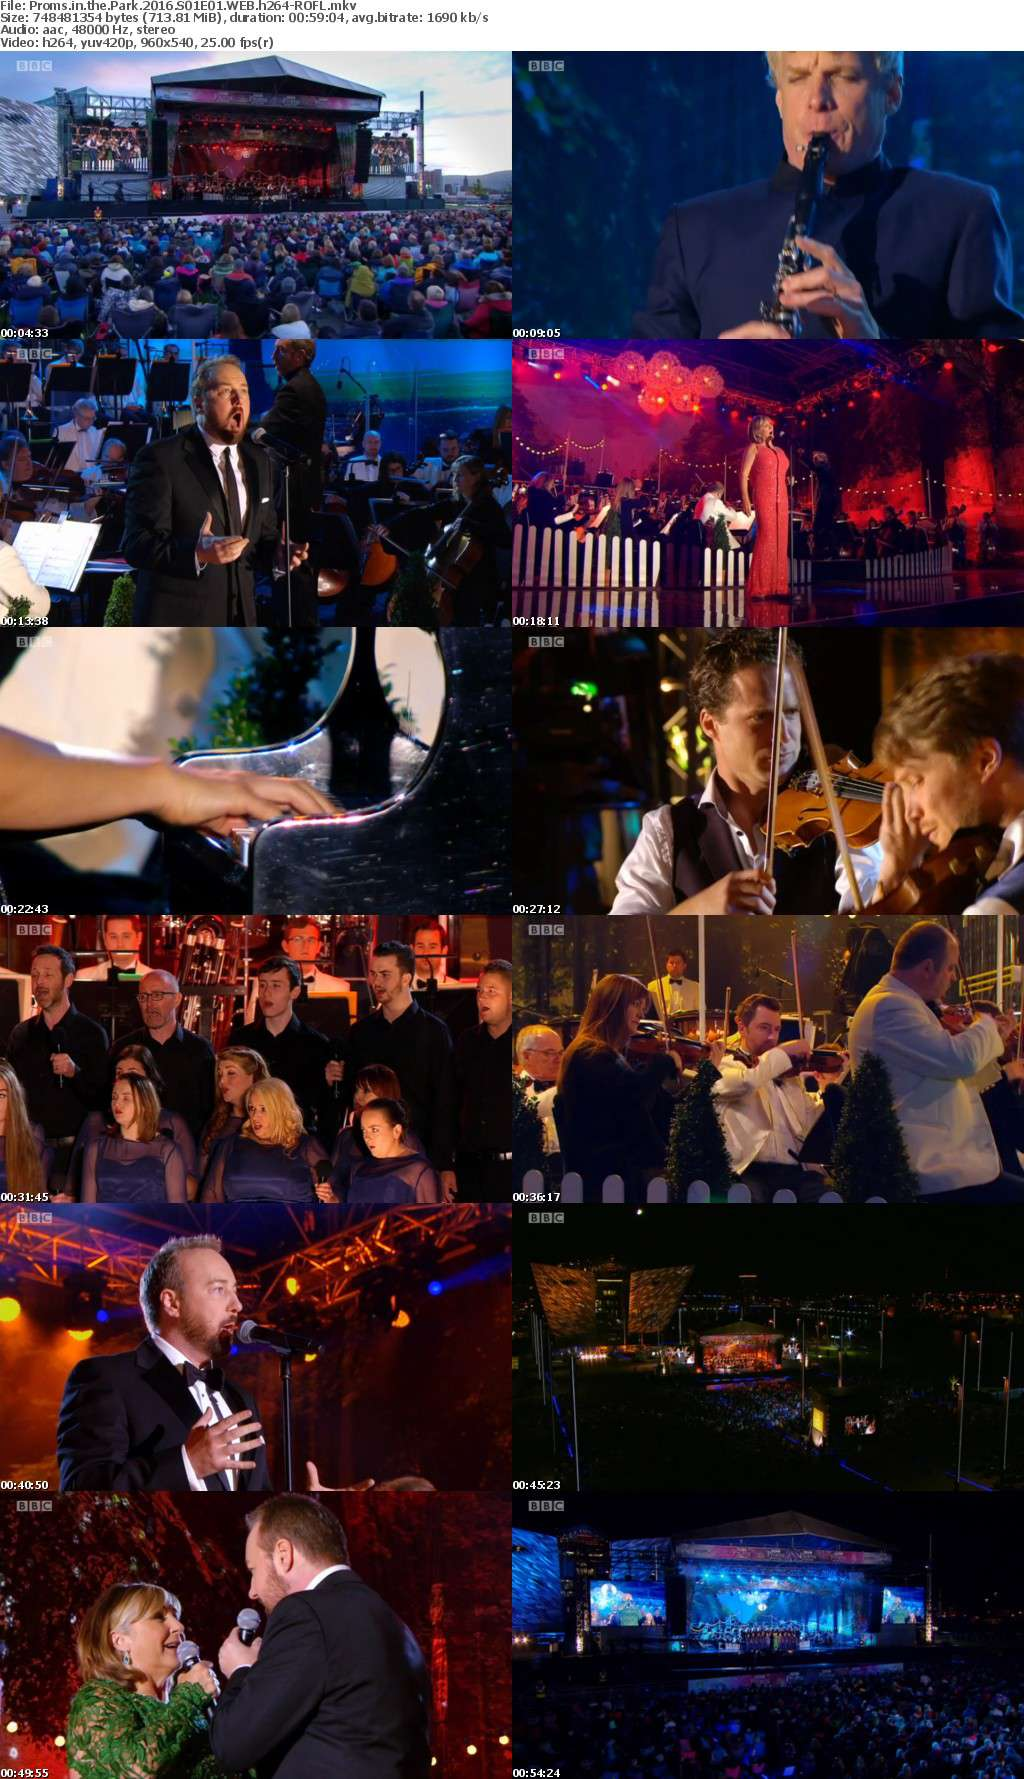 Proms in the Park 2016 S01E01 WEB h264-ROFL